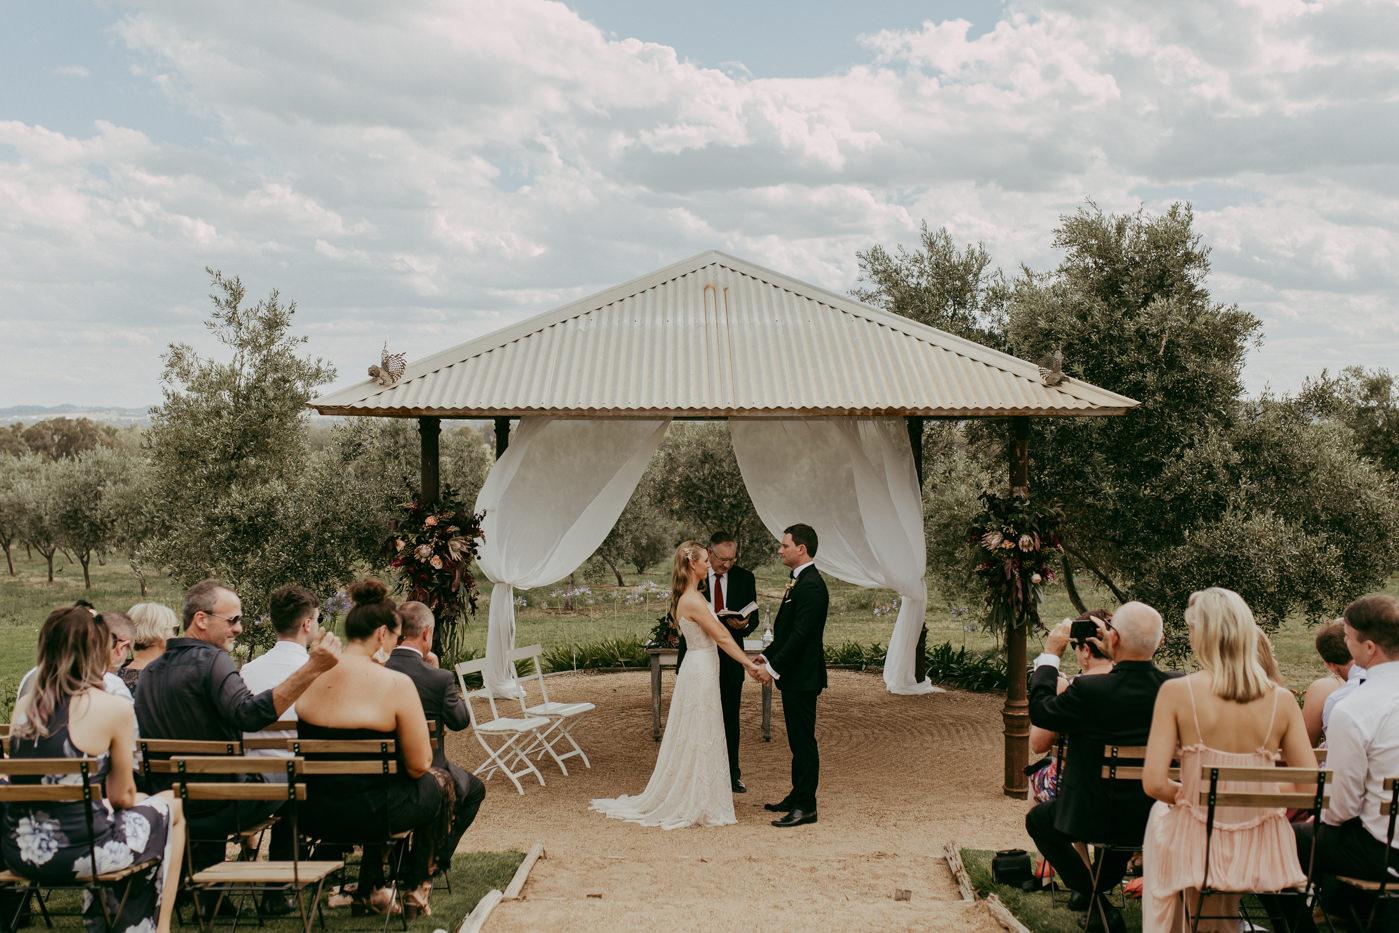 Anthony & Eliet - Wagga Wagga Wedding - Country NSW - Samantha Heather Photography-102.jpg